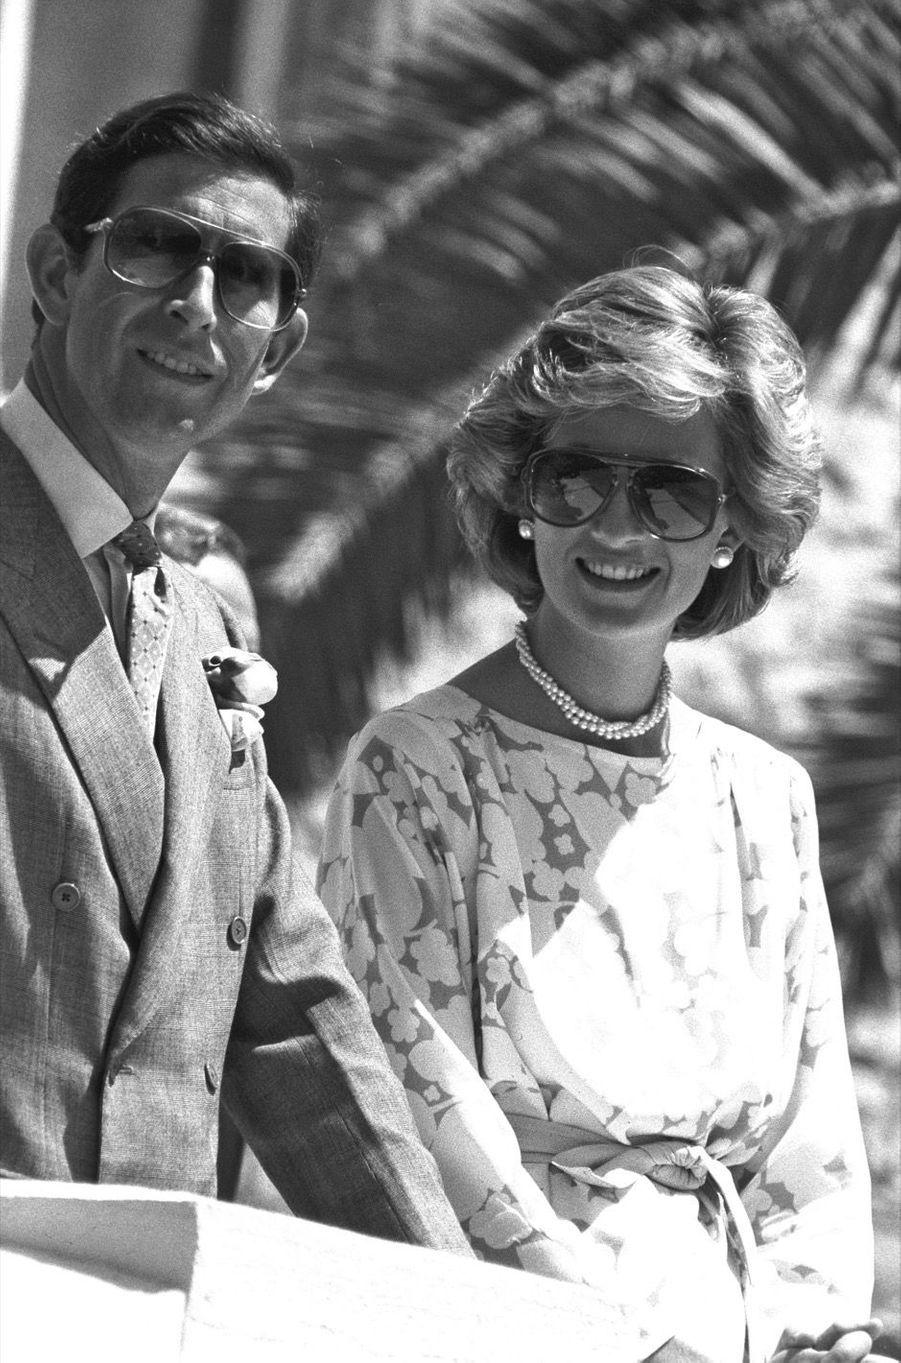 La princesse Diana et le prince Charles àBari en Italie, le 7 mai 1985.